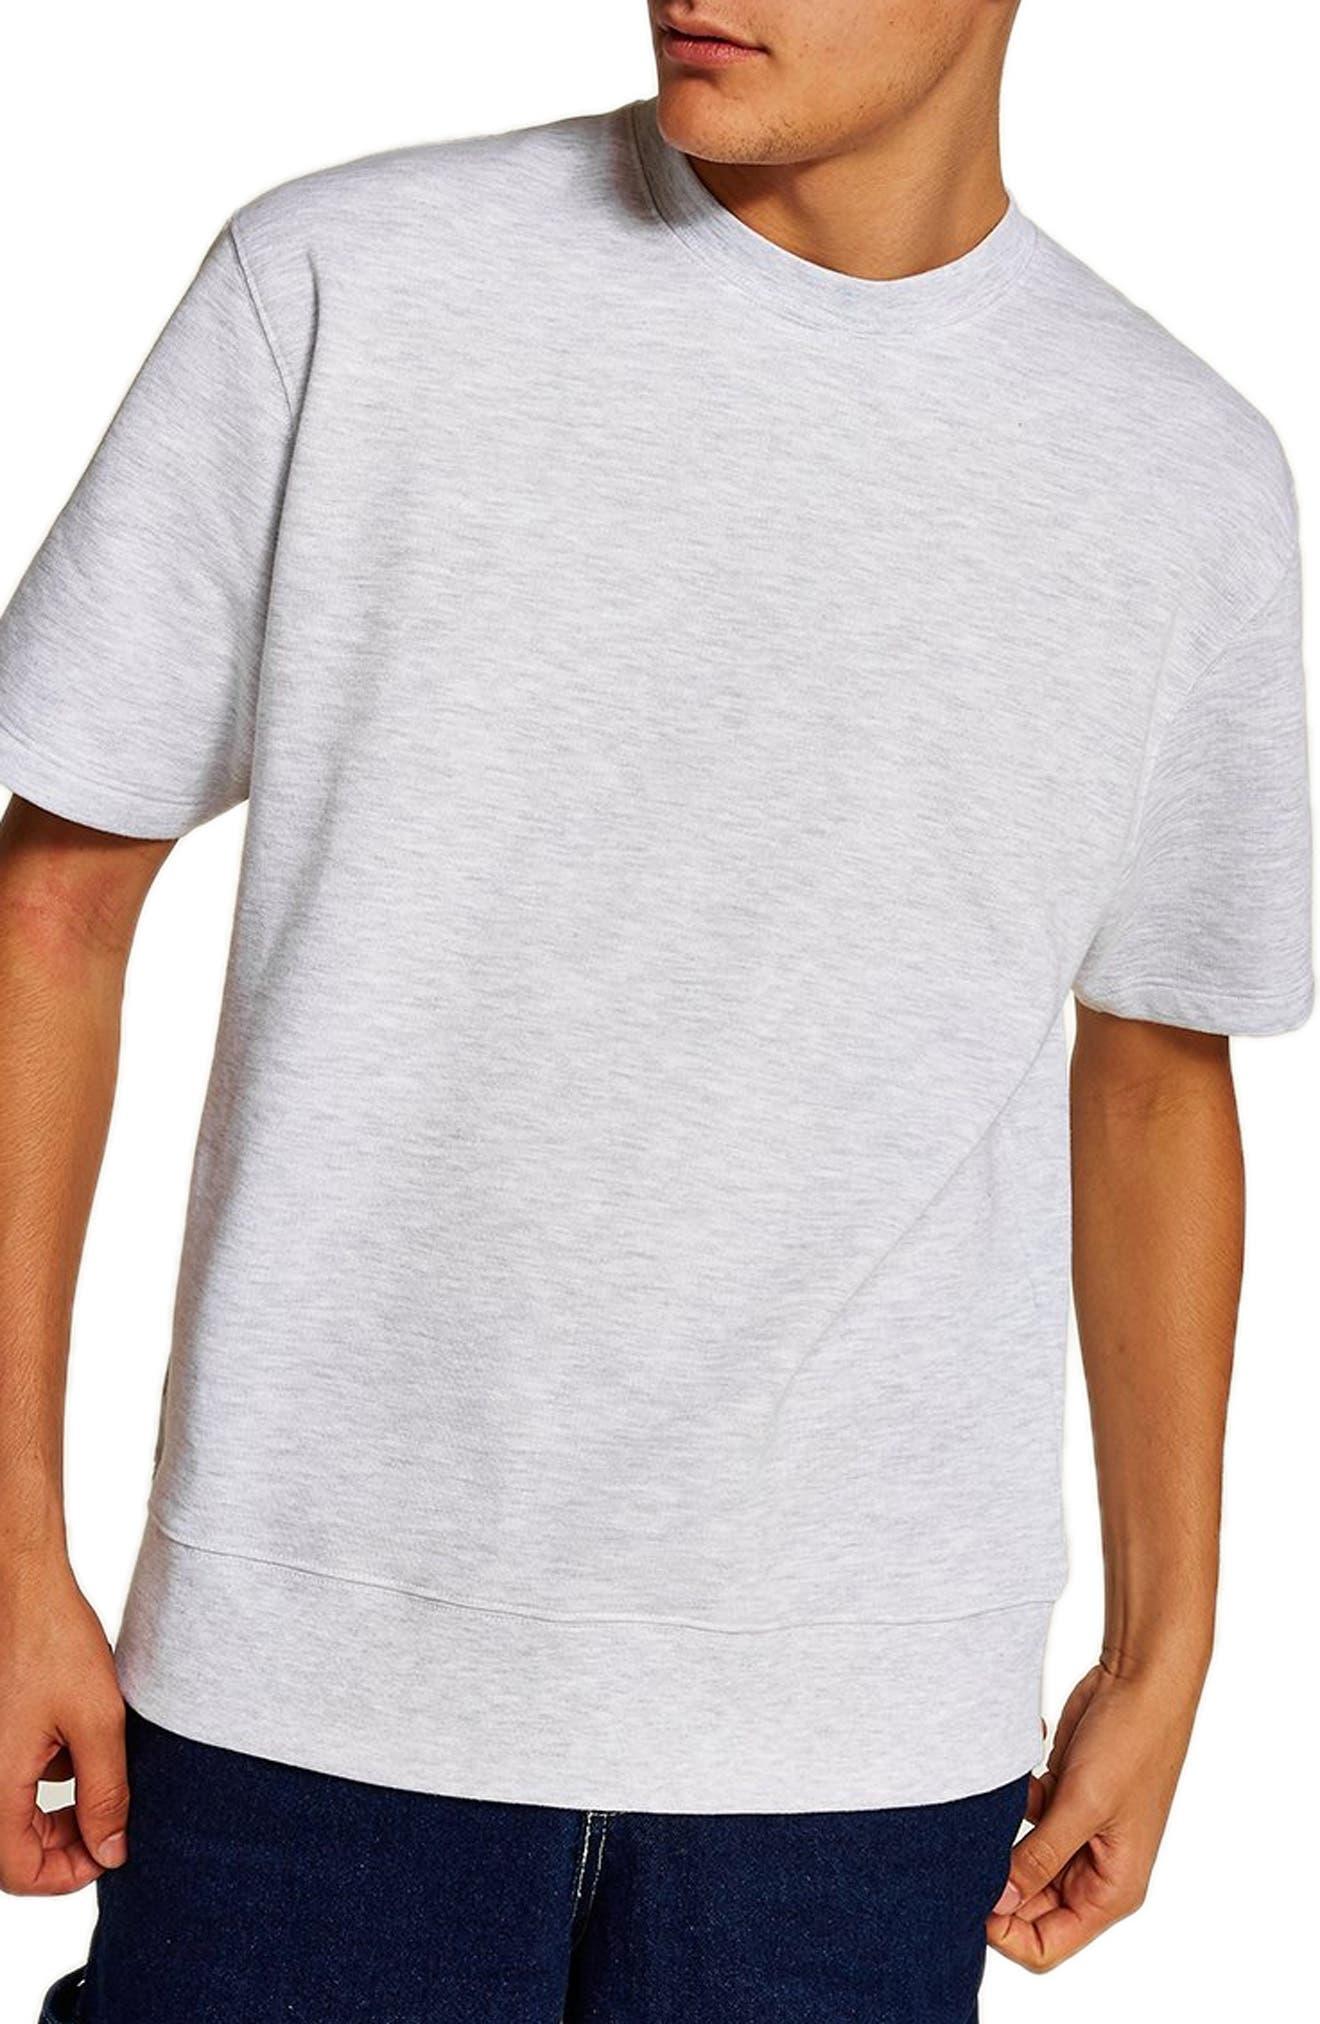 Short Sleeve Crewneck Sweatshirt,                             Main thumbnail 1, color,                             LIGHT GREY